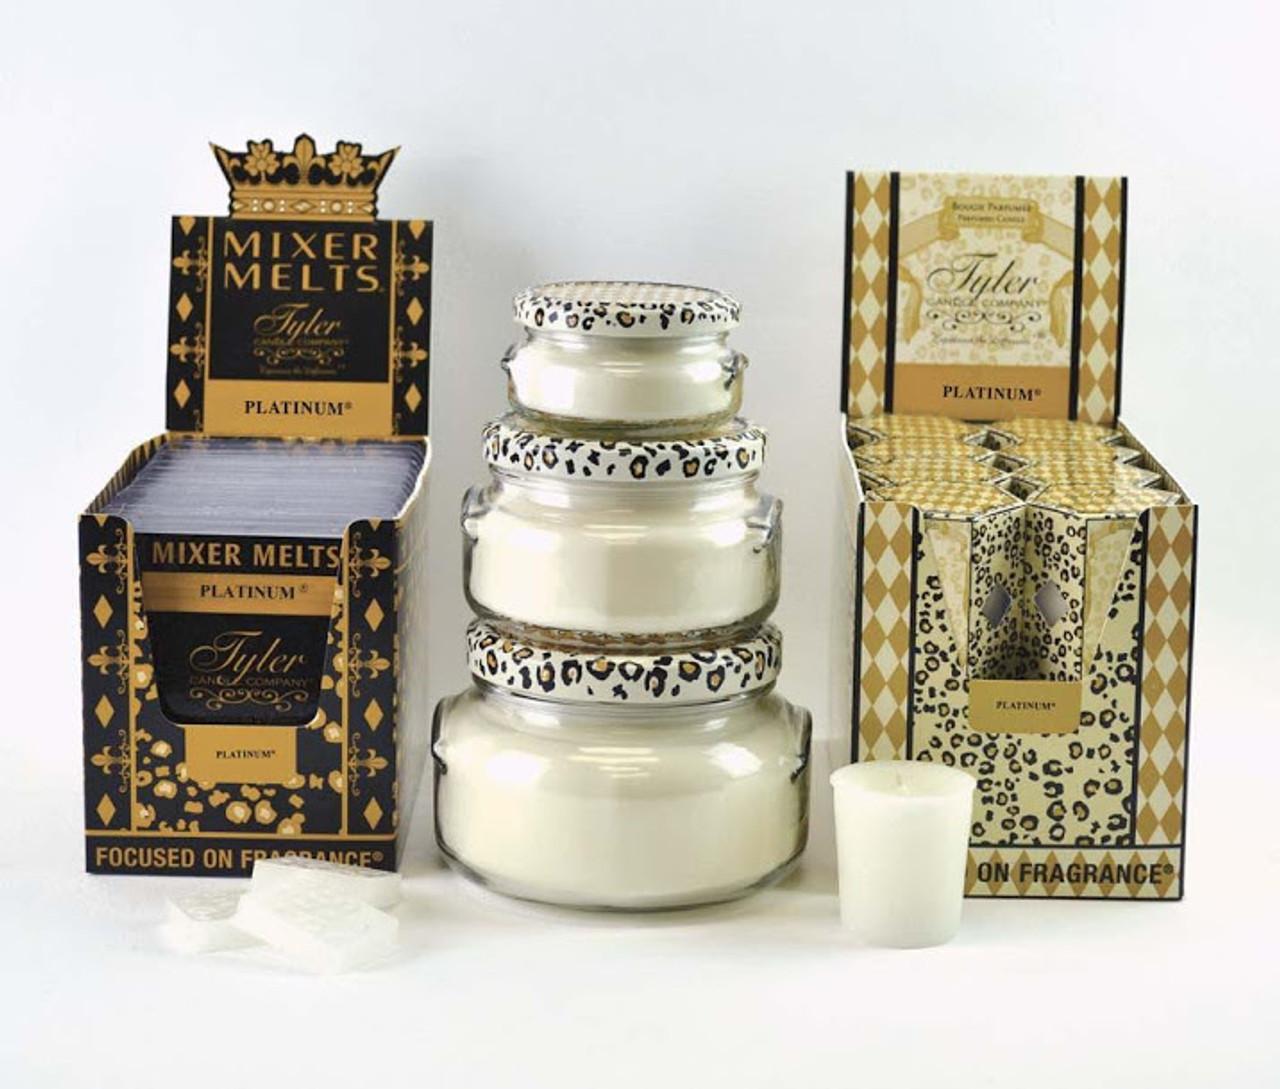 22 oz Platinum Candle Tyler Candle Company